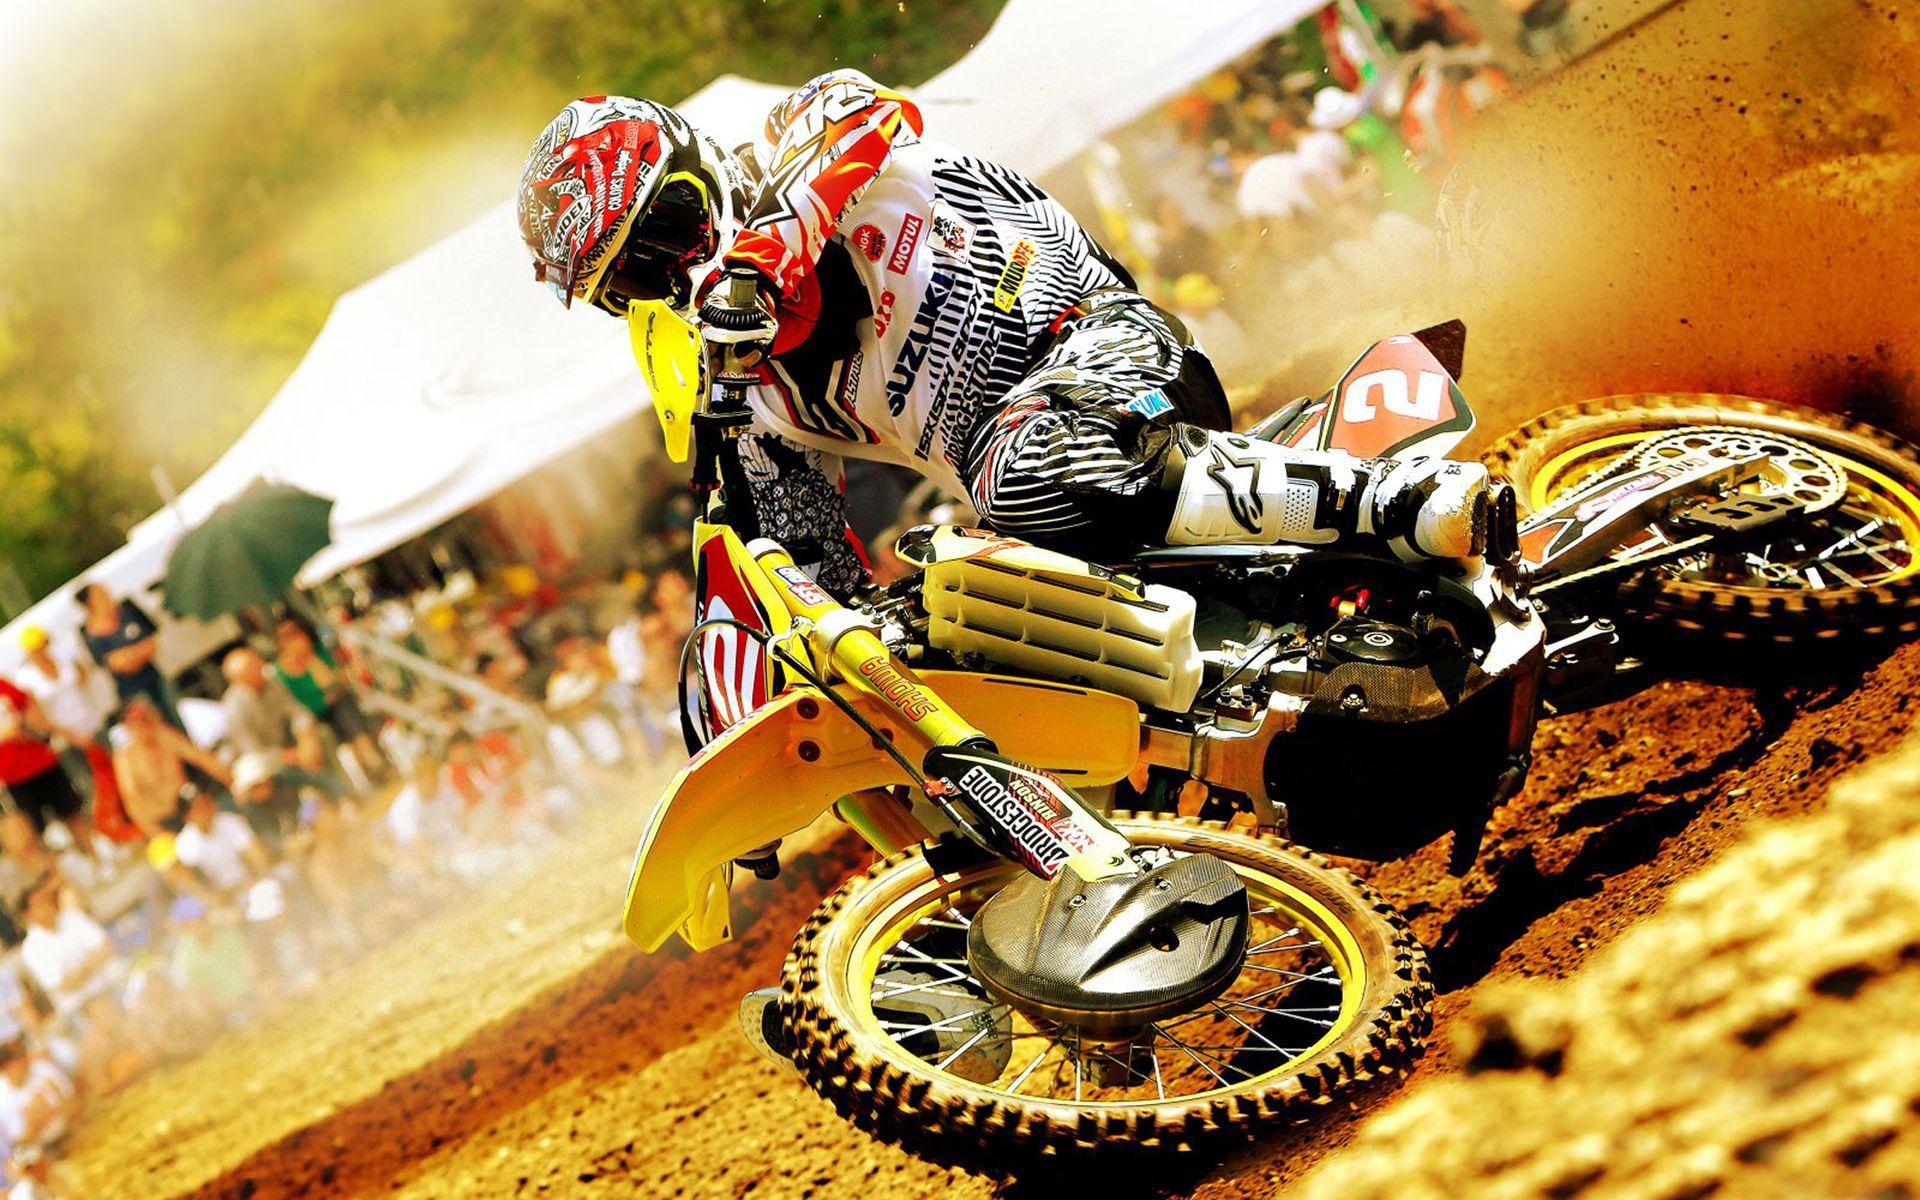 Ultra HD motocross suzuki rmz 450